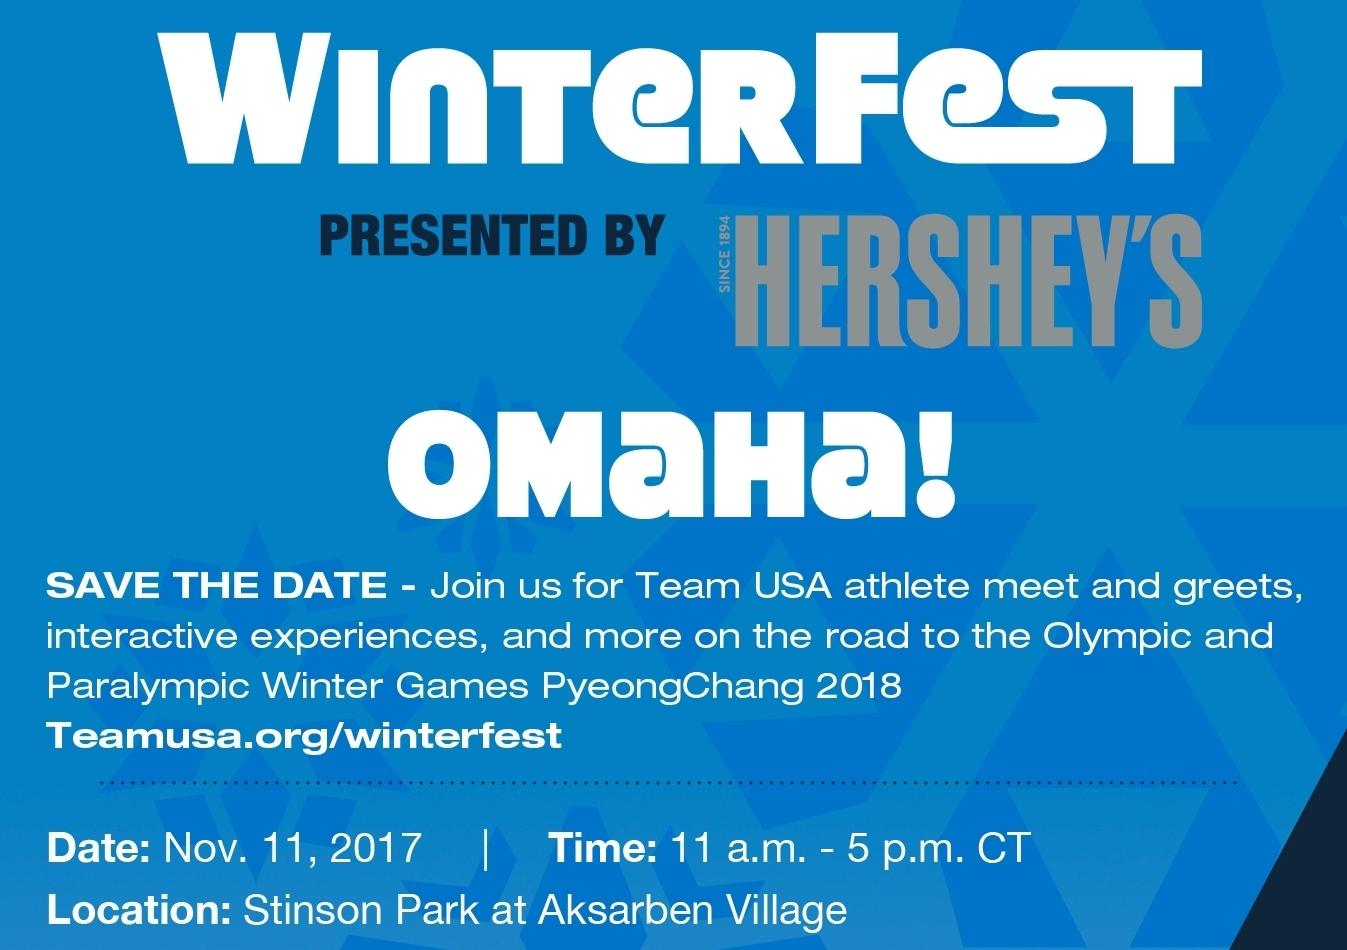 WinterFest_03_Omaha_Invite_1_FINAL.jpg